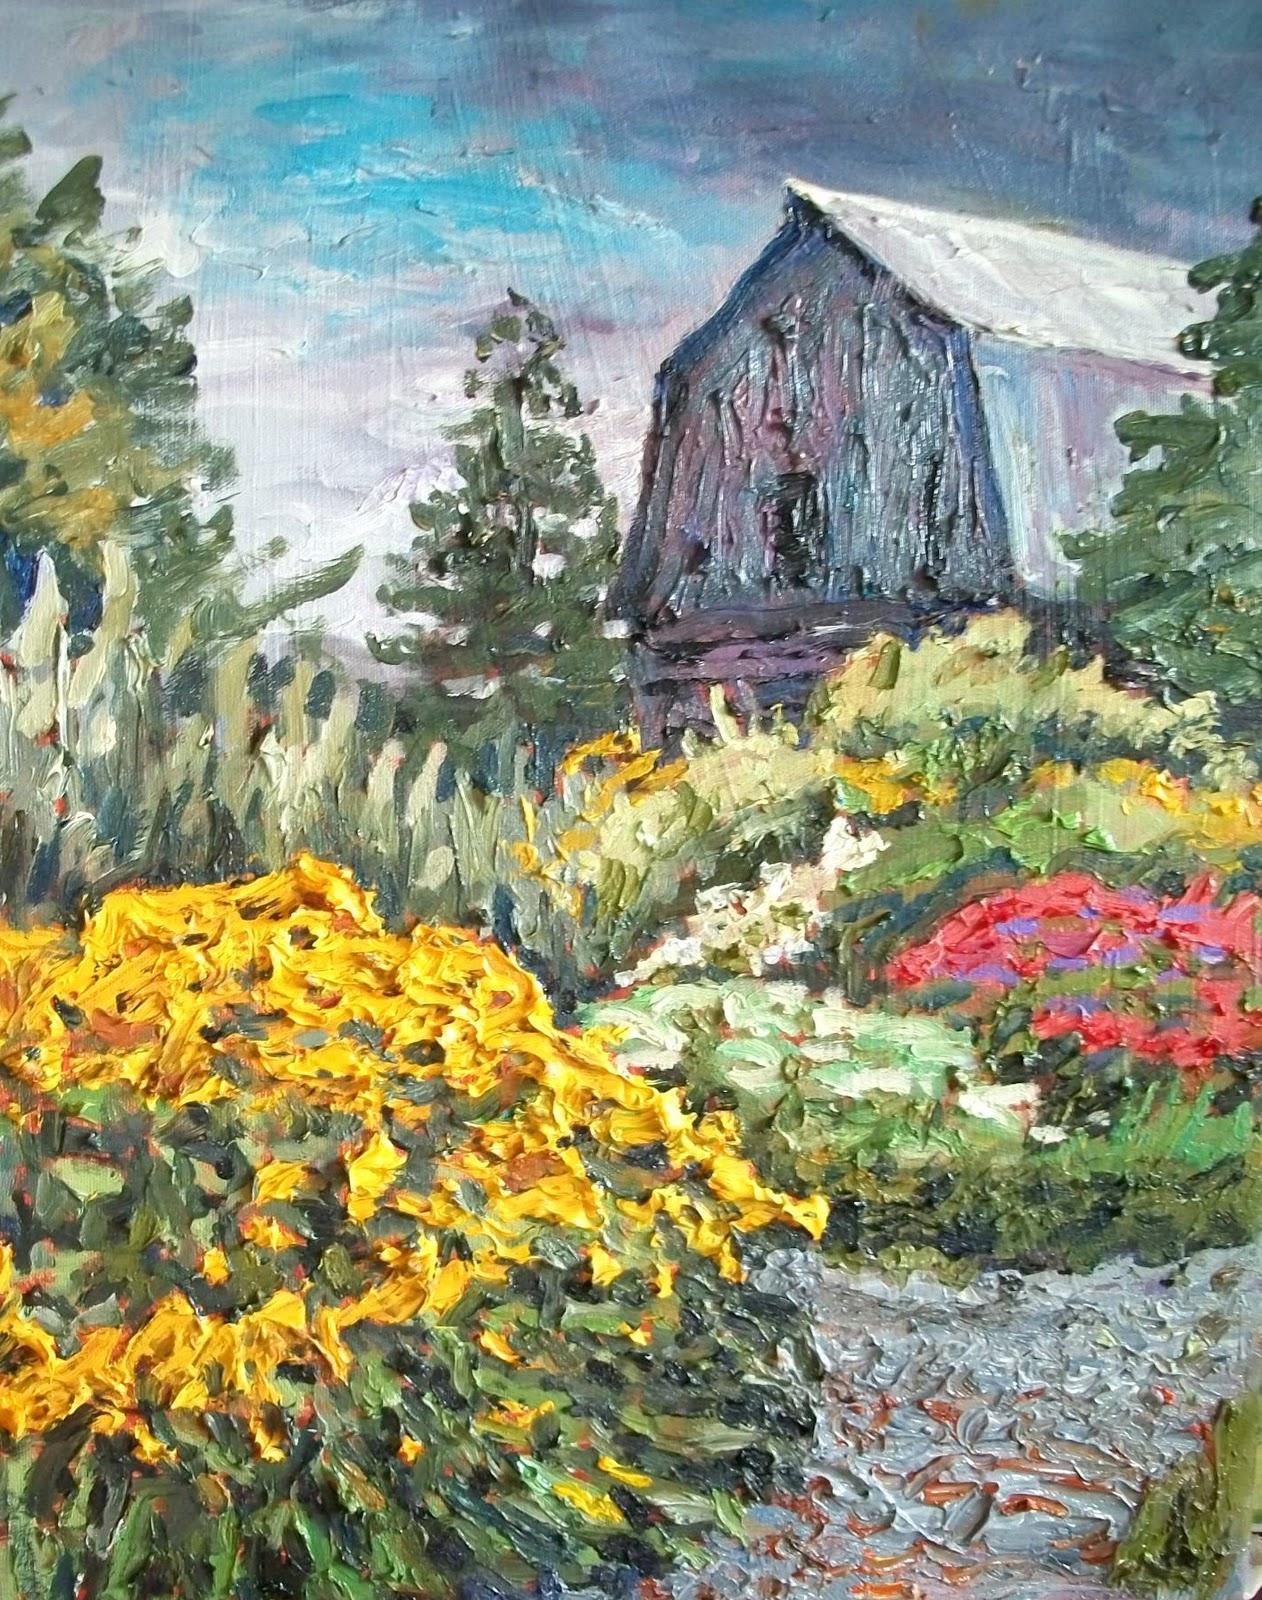 paul smith alice 39 s flower garden and barn. Black Bedroom Furniture Sets. Home Design Ideas